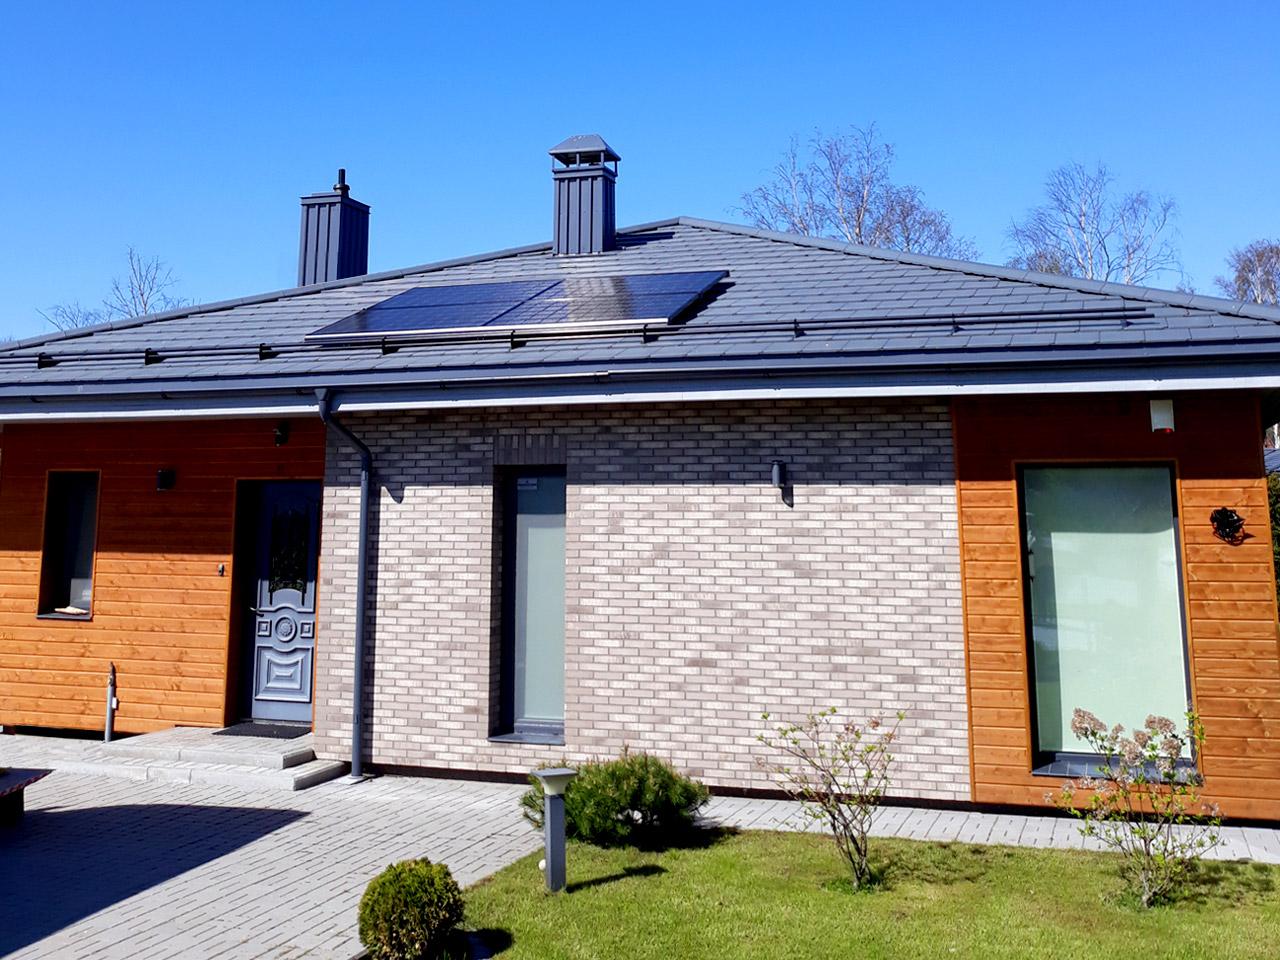 instalation of solar paneles